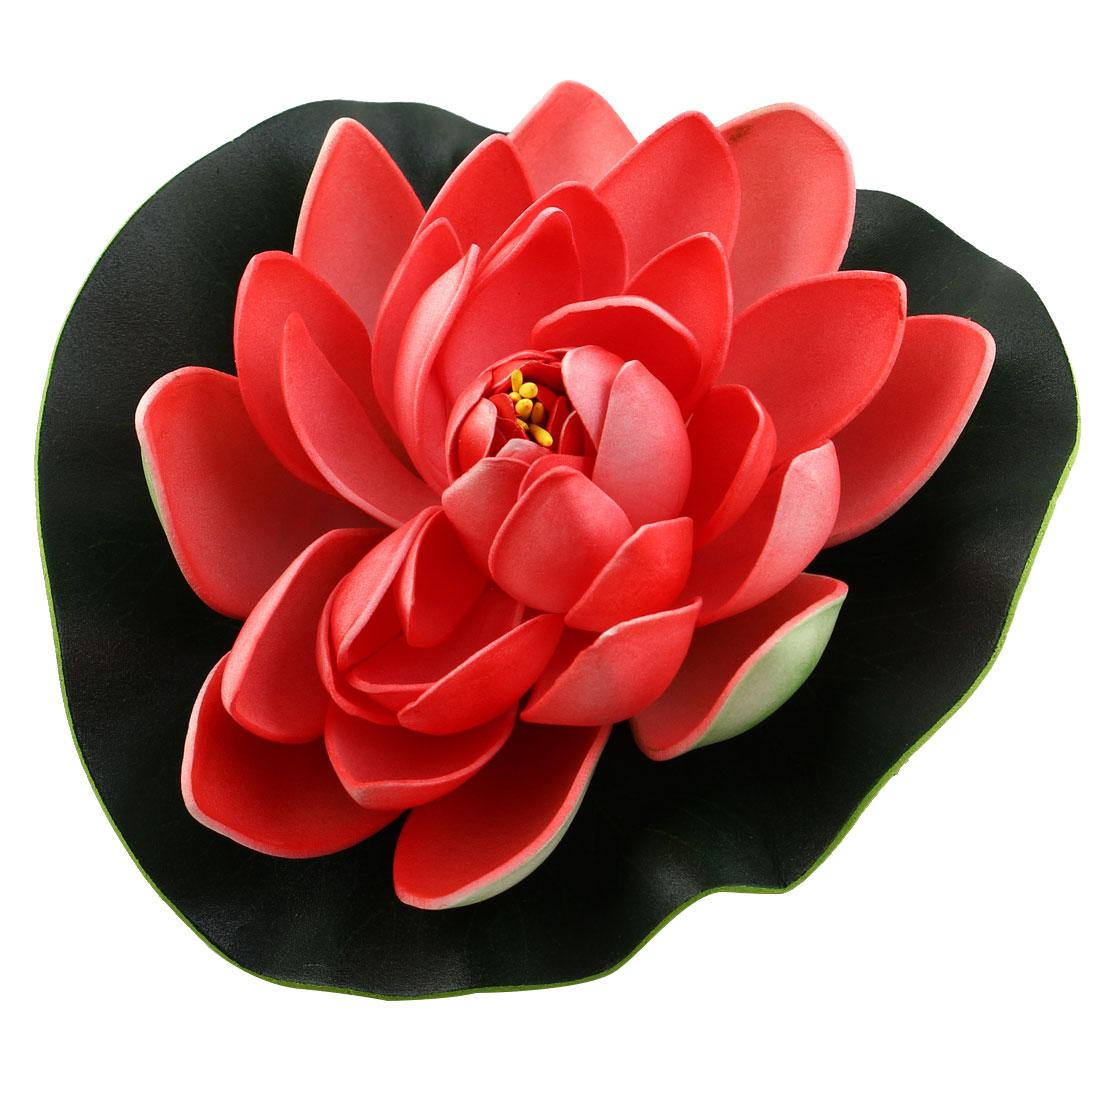 Aquarium Foam Artificial Floating Lotus Flower Leaf Ornament Green Red 18cm Dia